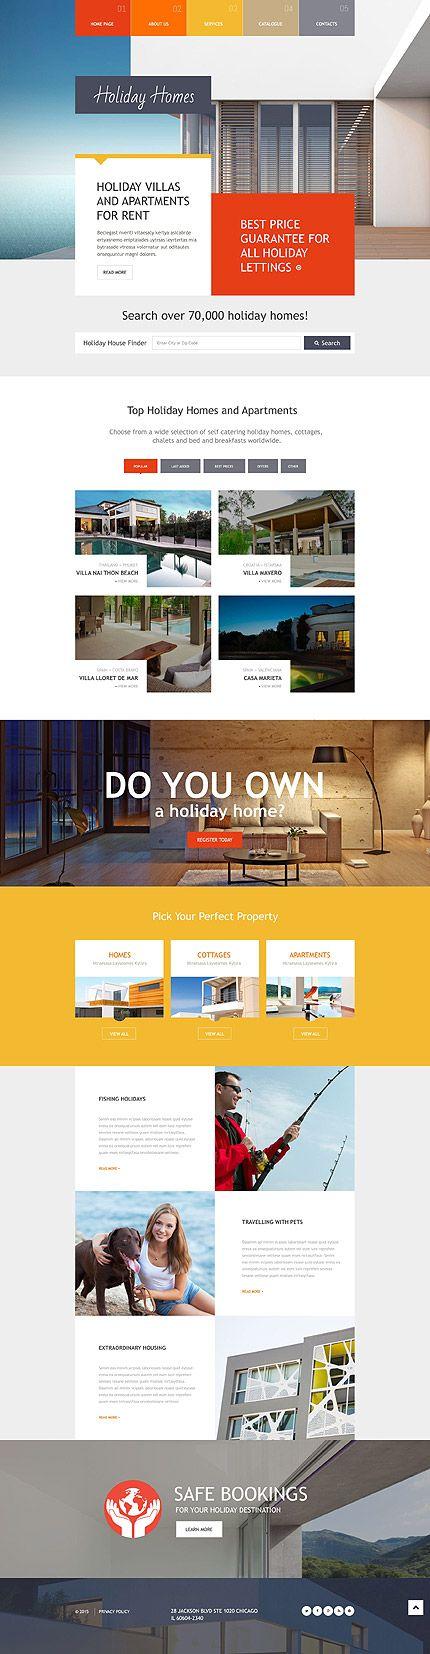 Best 25+ Rental websites ideas on Pinterest | Investment property ...